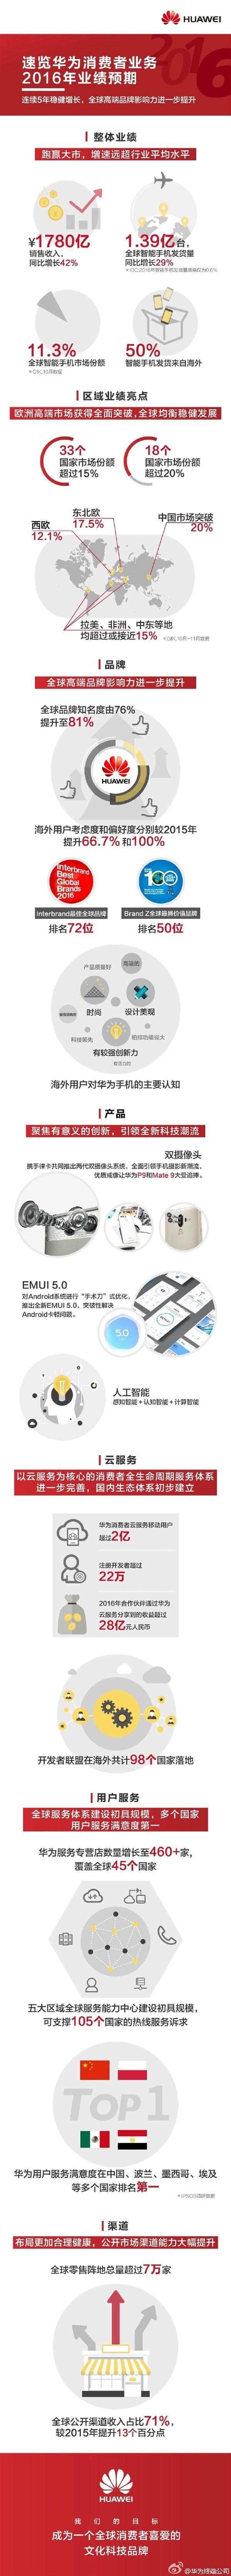 Huawei рассказала об успехах за 2016 год – фото 2